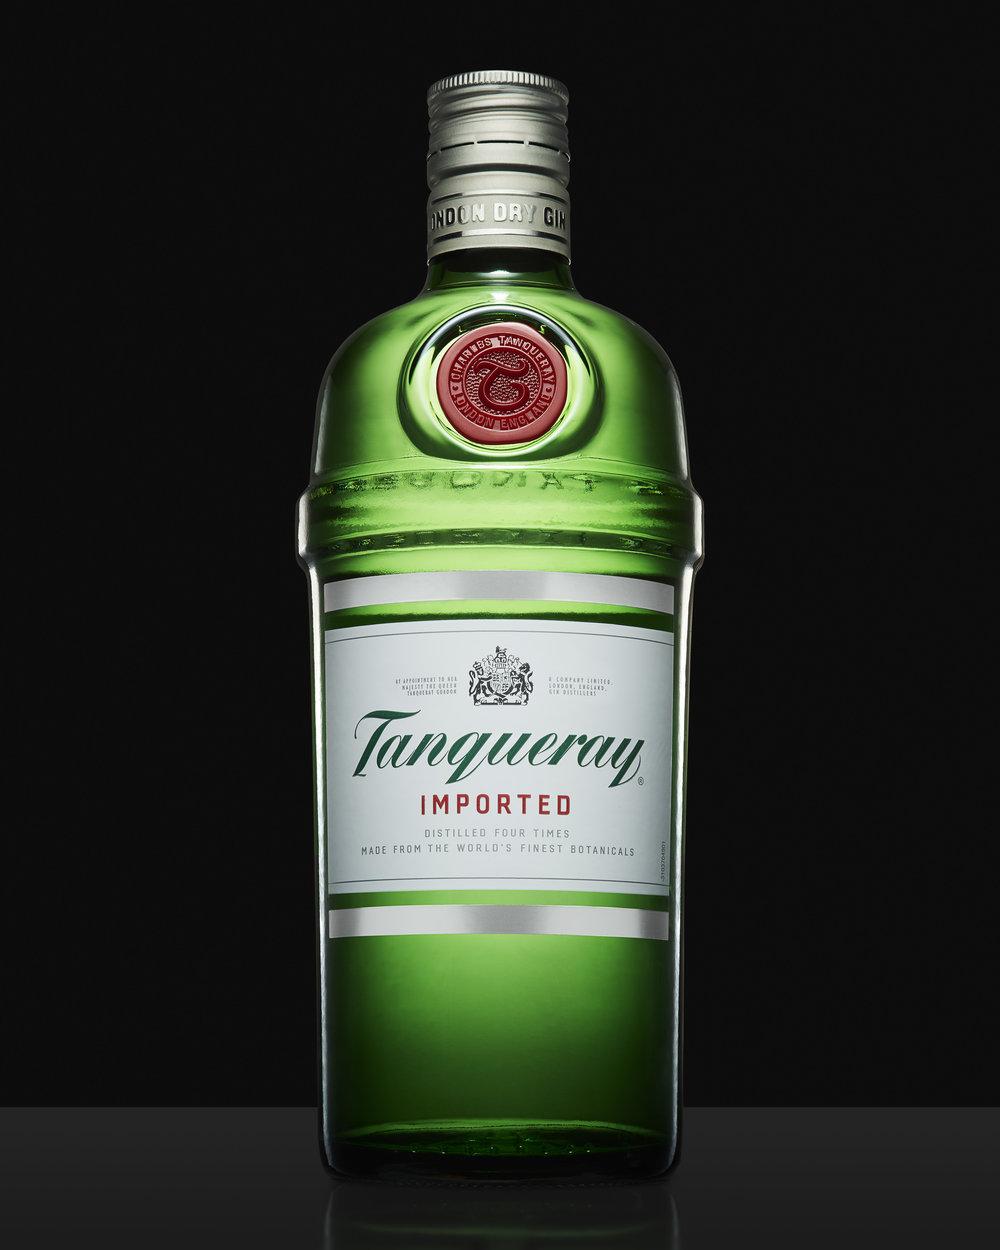 170910_F+G Tanqueray_051_A.jpg